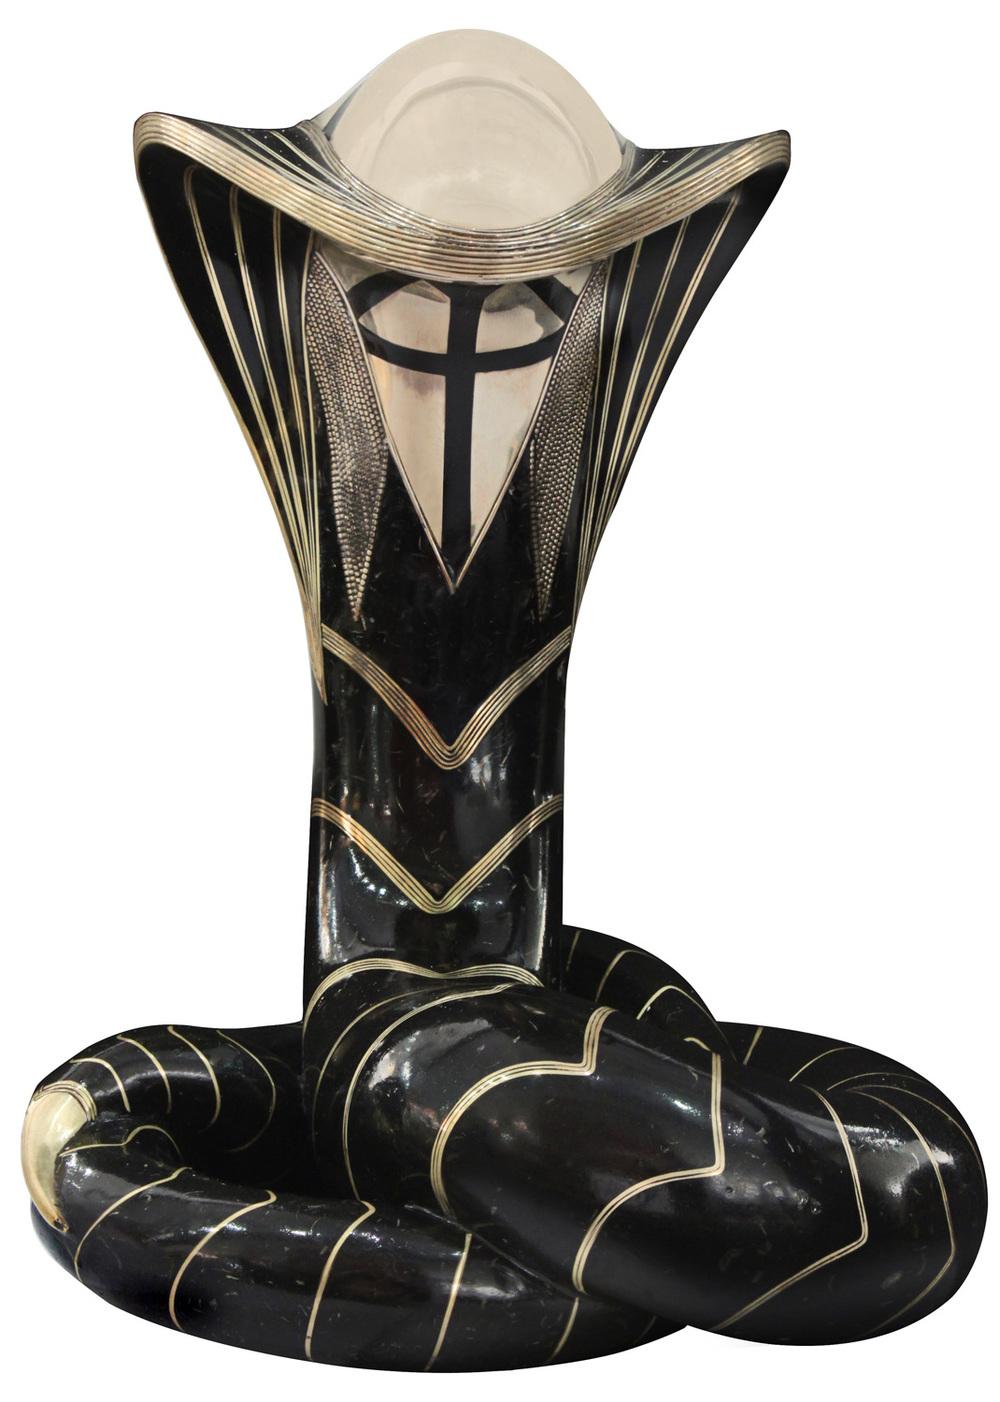 Estevesz 250 Cobra bronze+silver sculpture95 detail1 hires.jpg